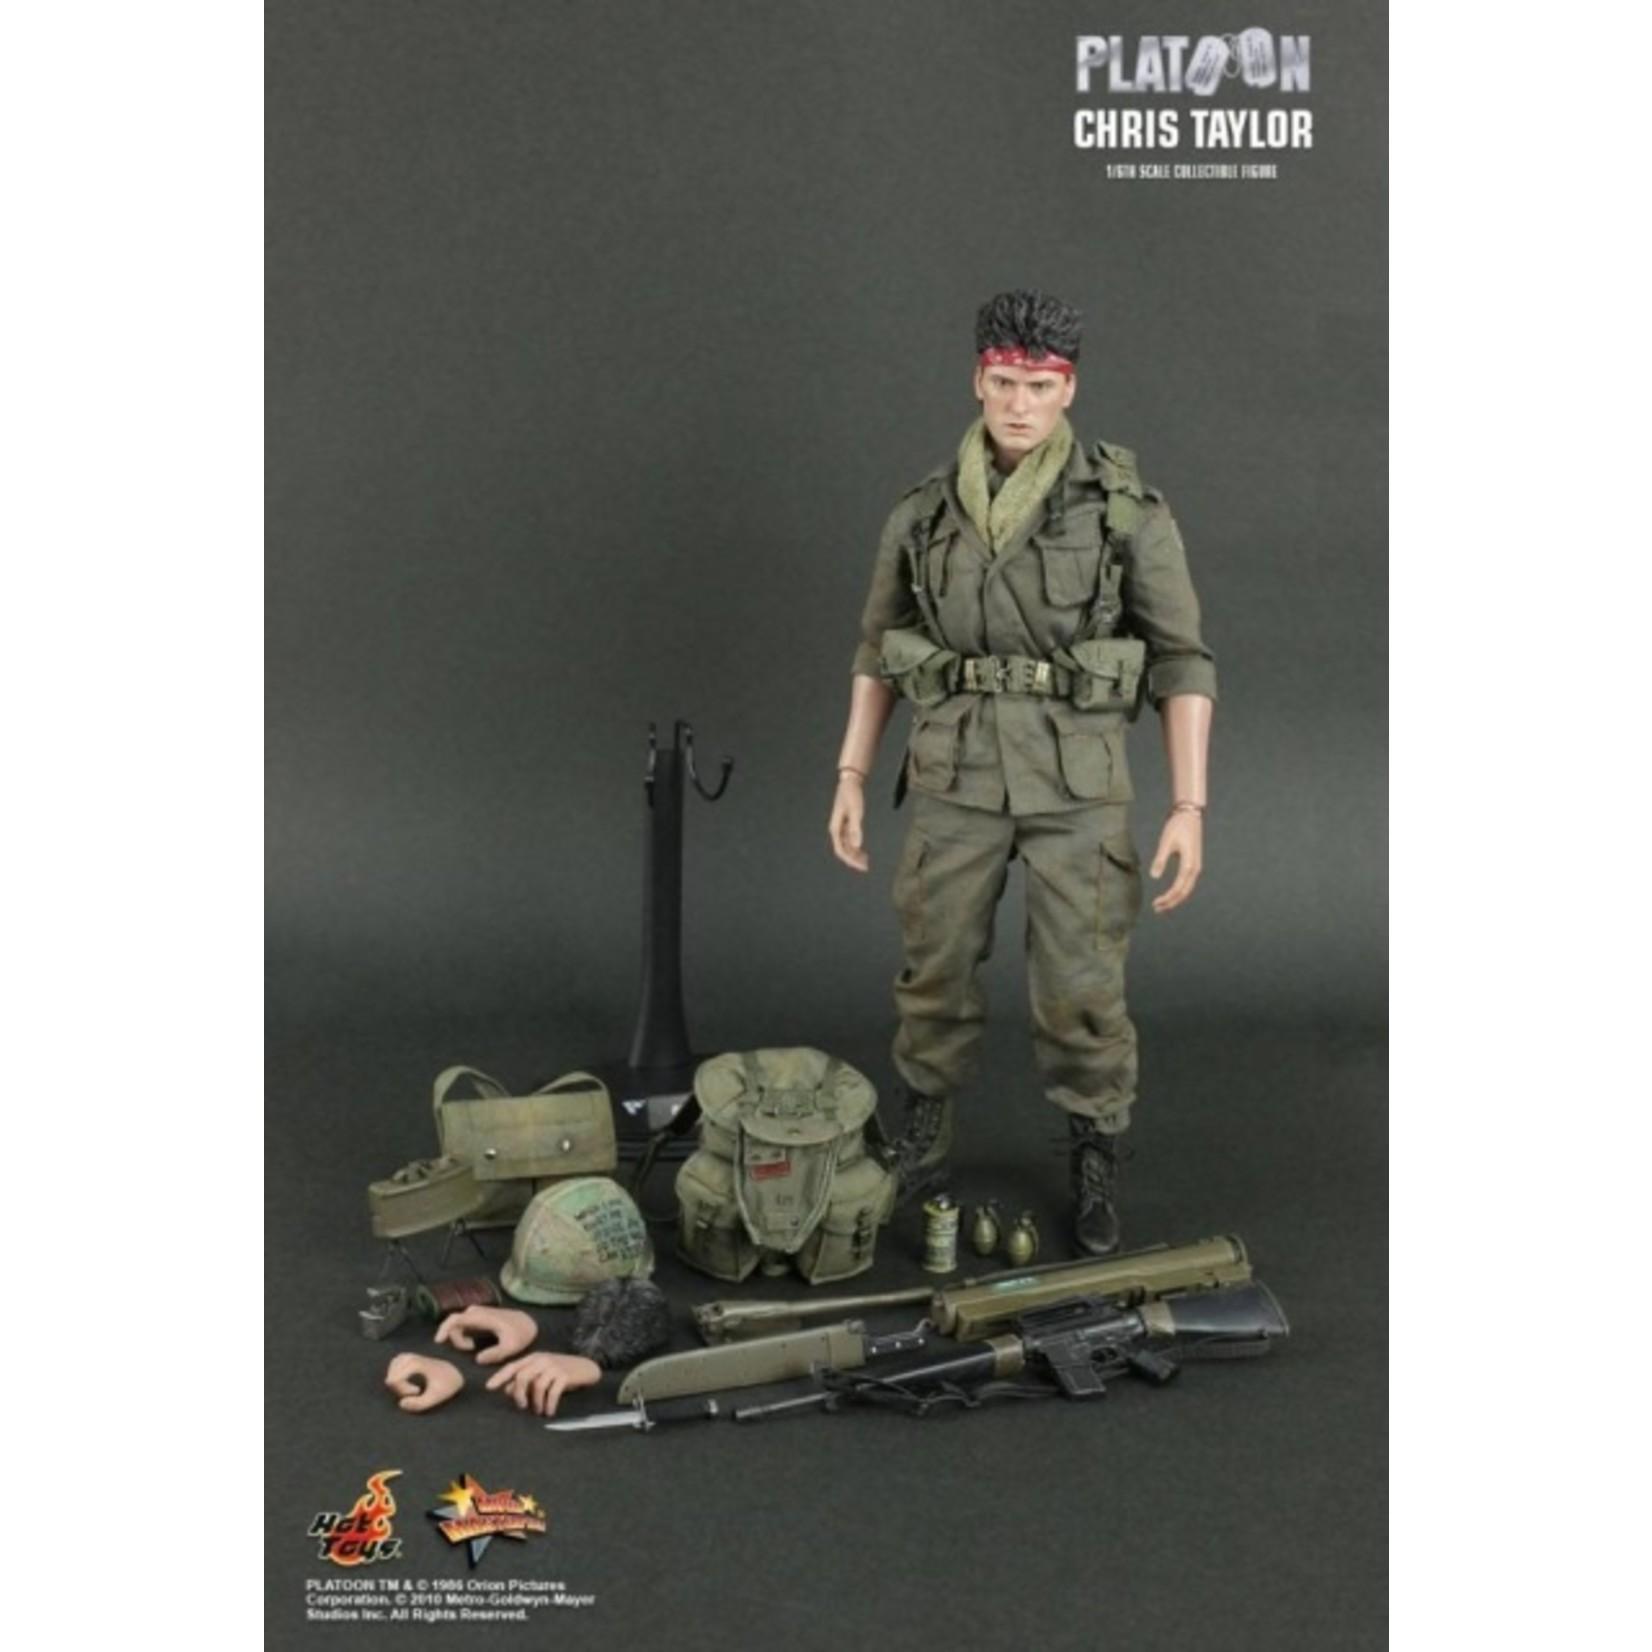 Hot Toys Platoon - Chris Taylor MMS135